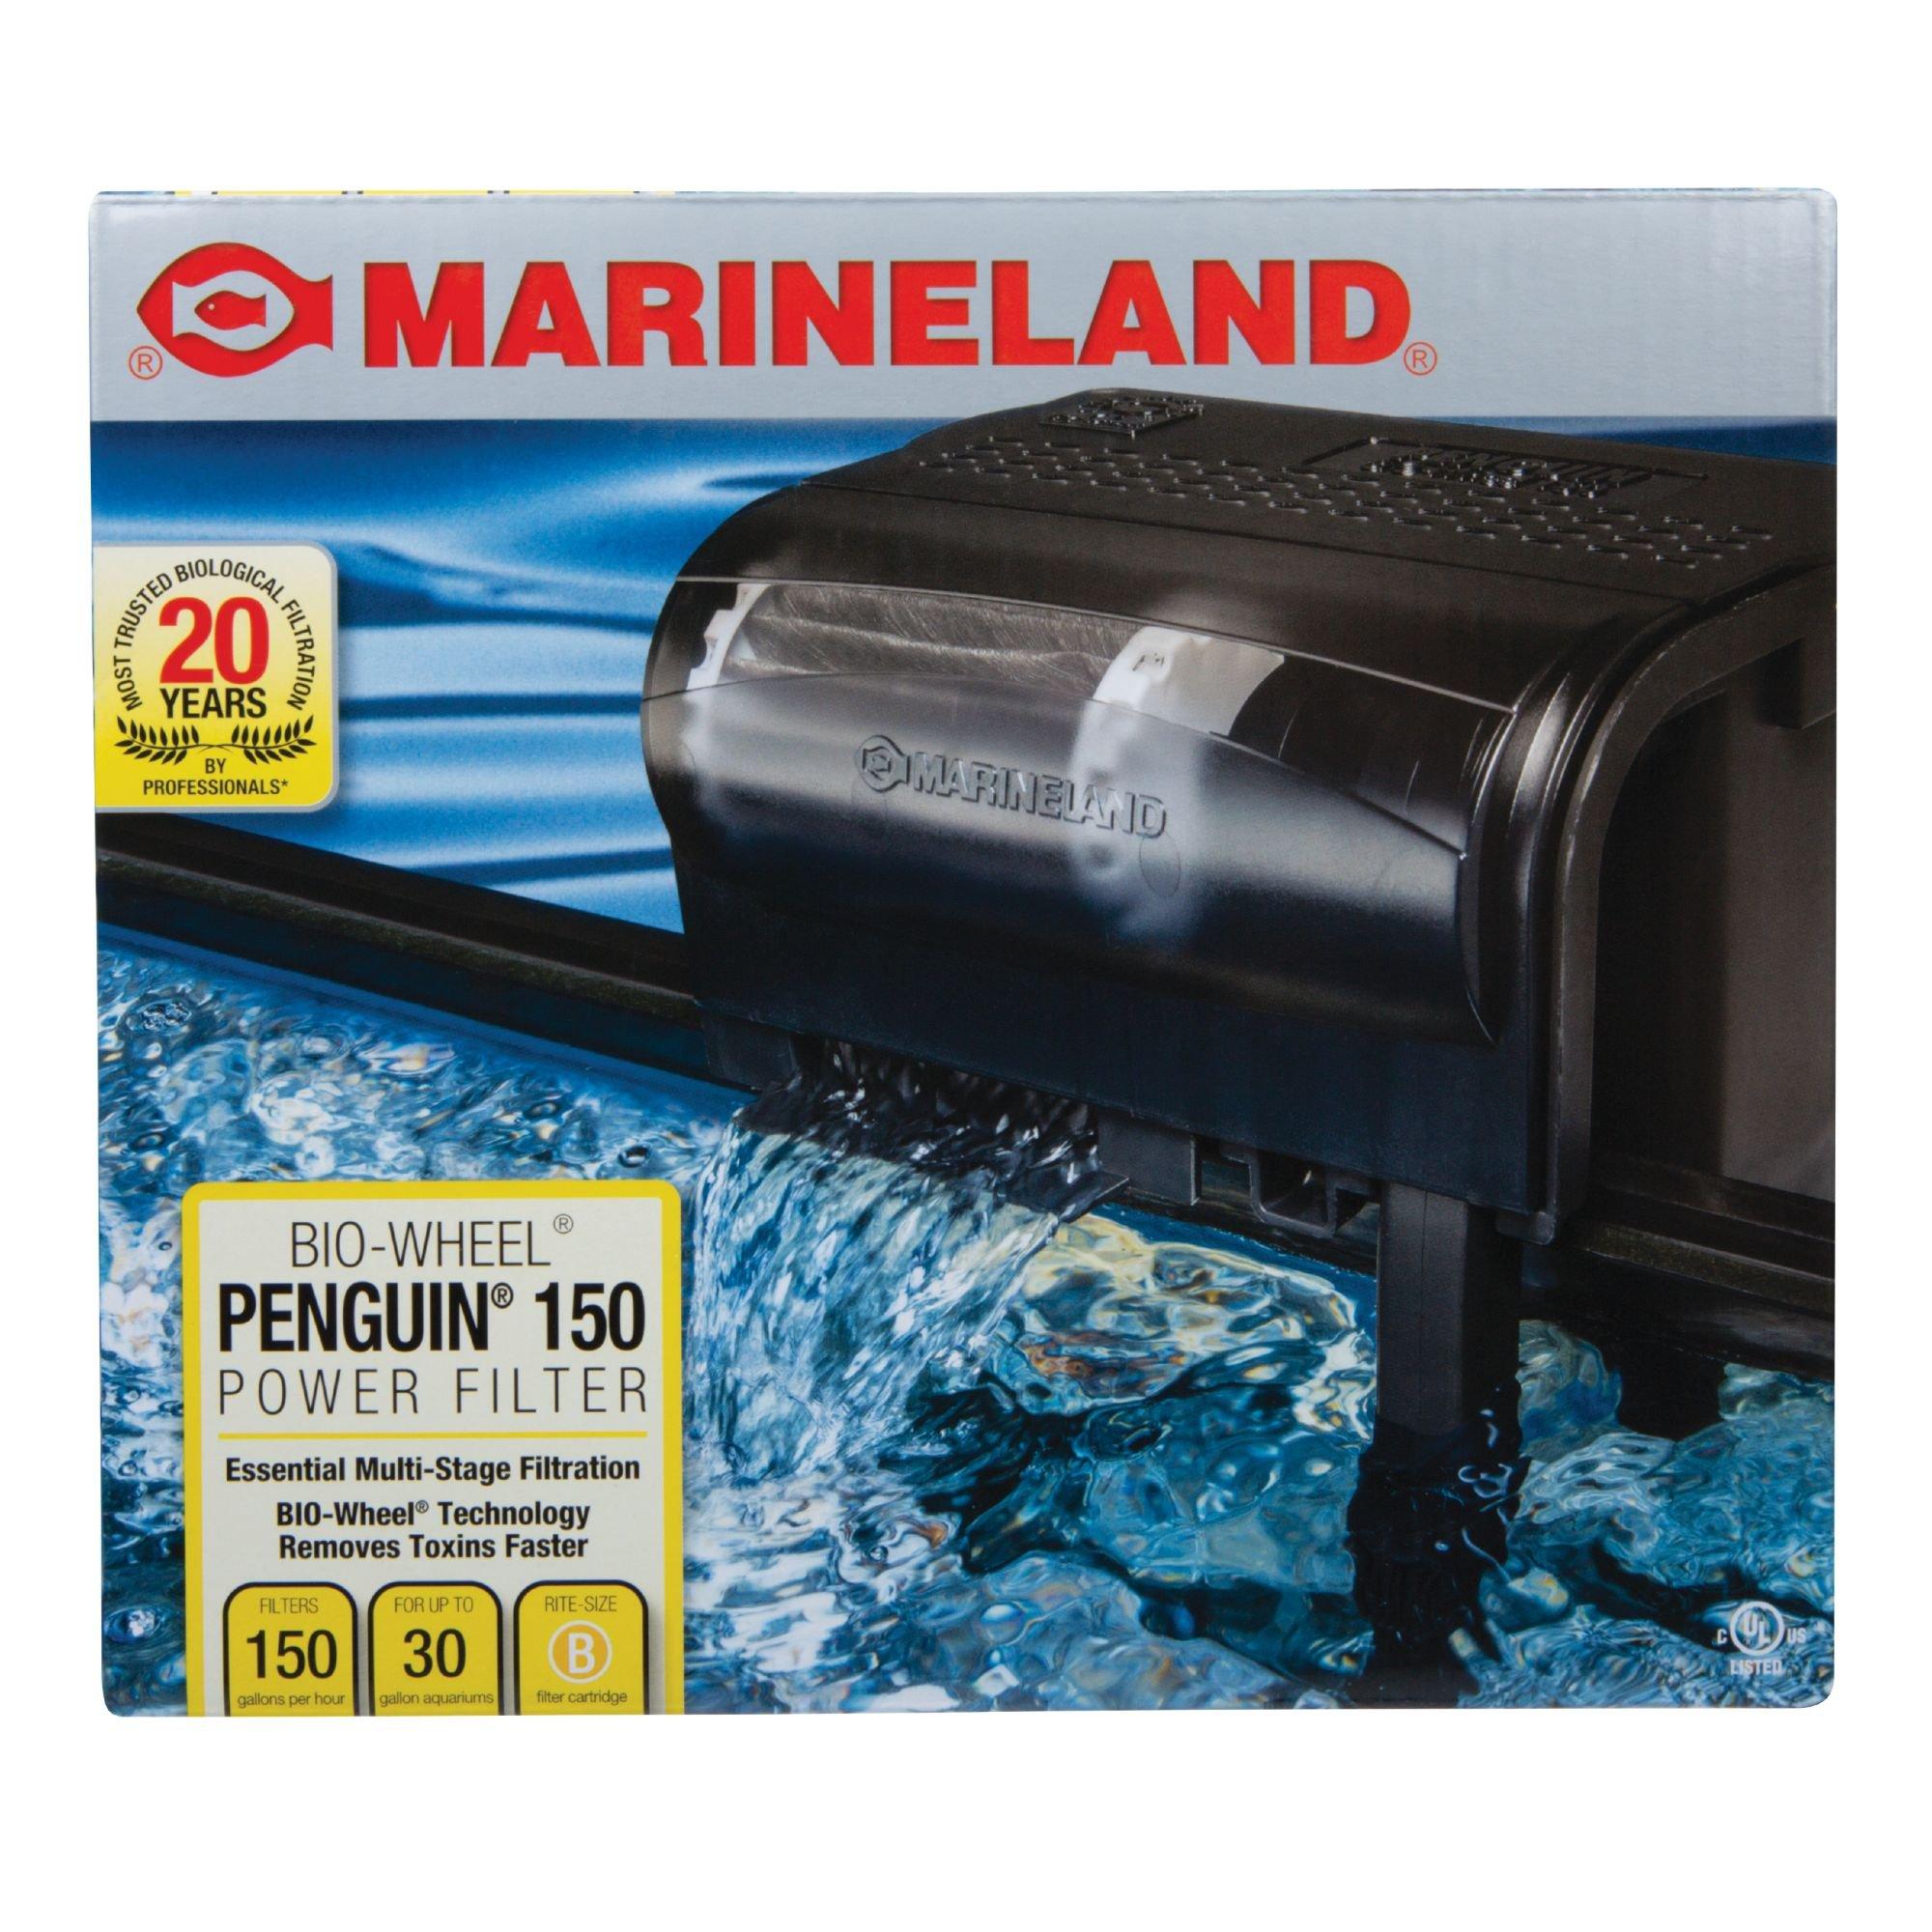 Marineland Penguin 150 BIO-Wheel Power Filter   Petco